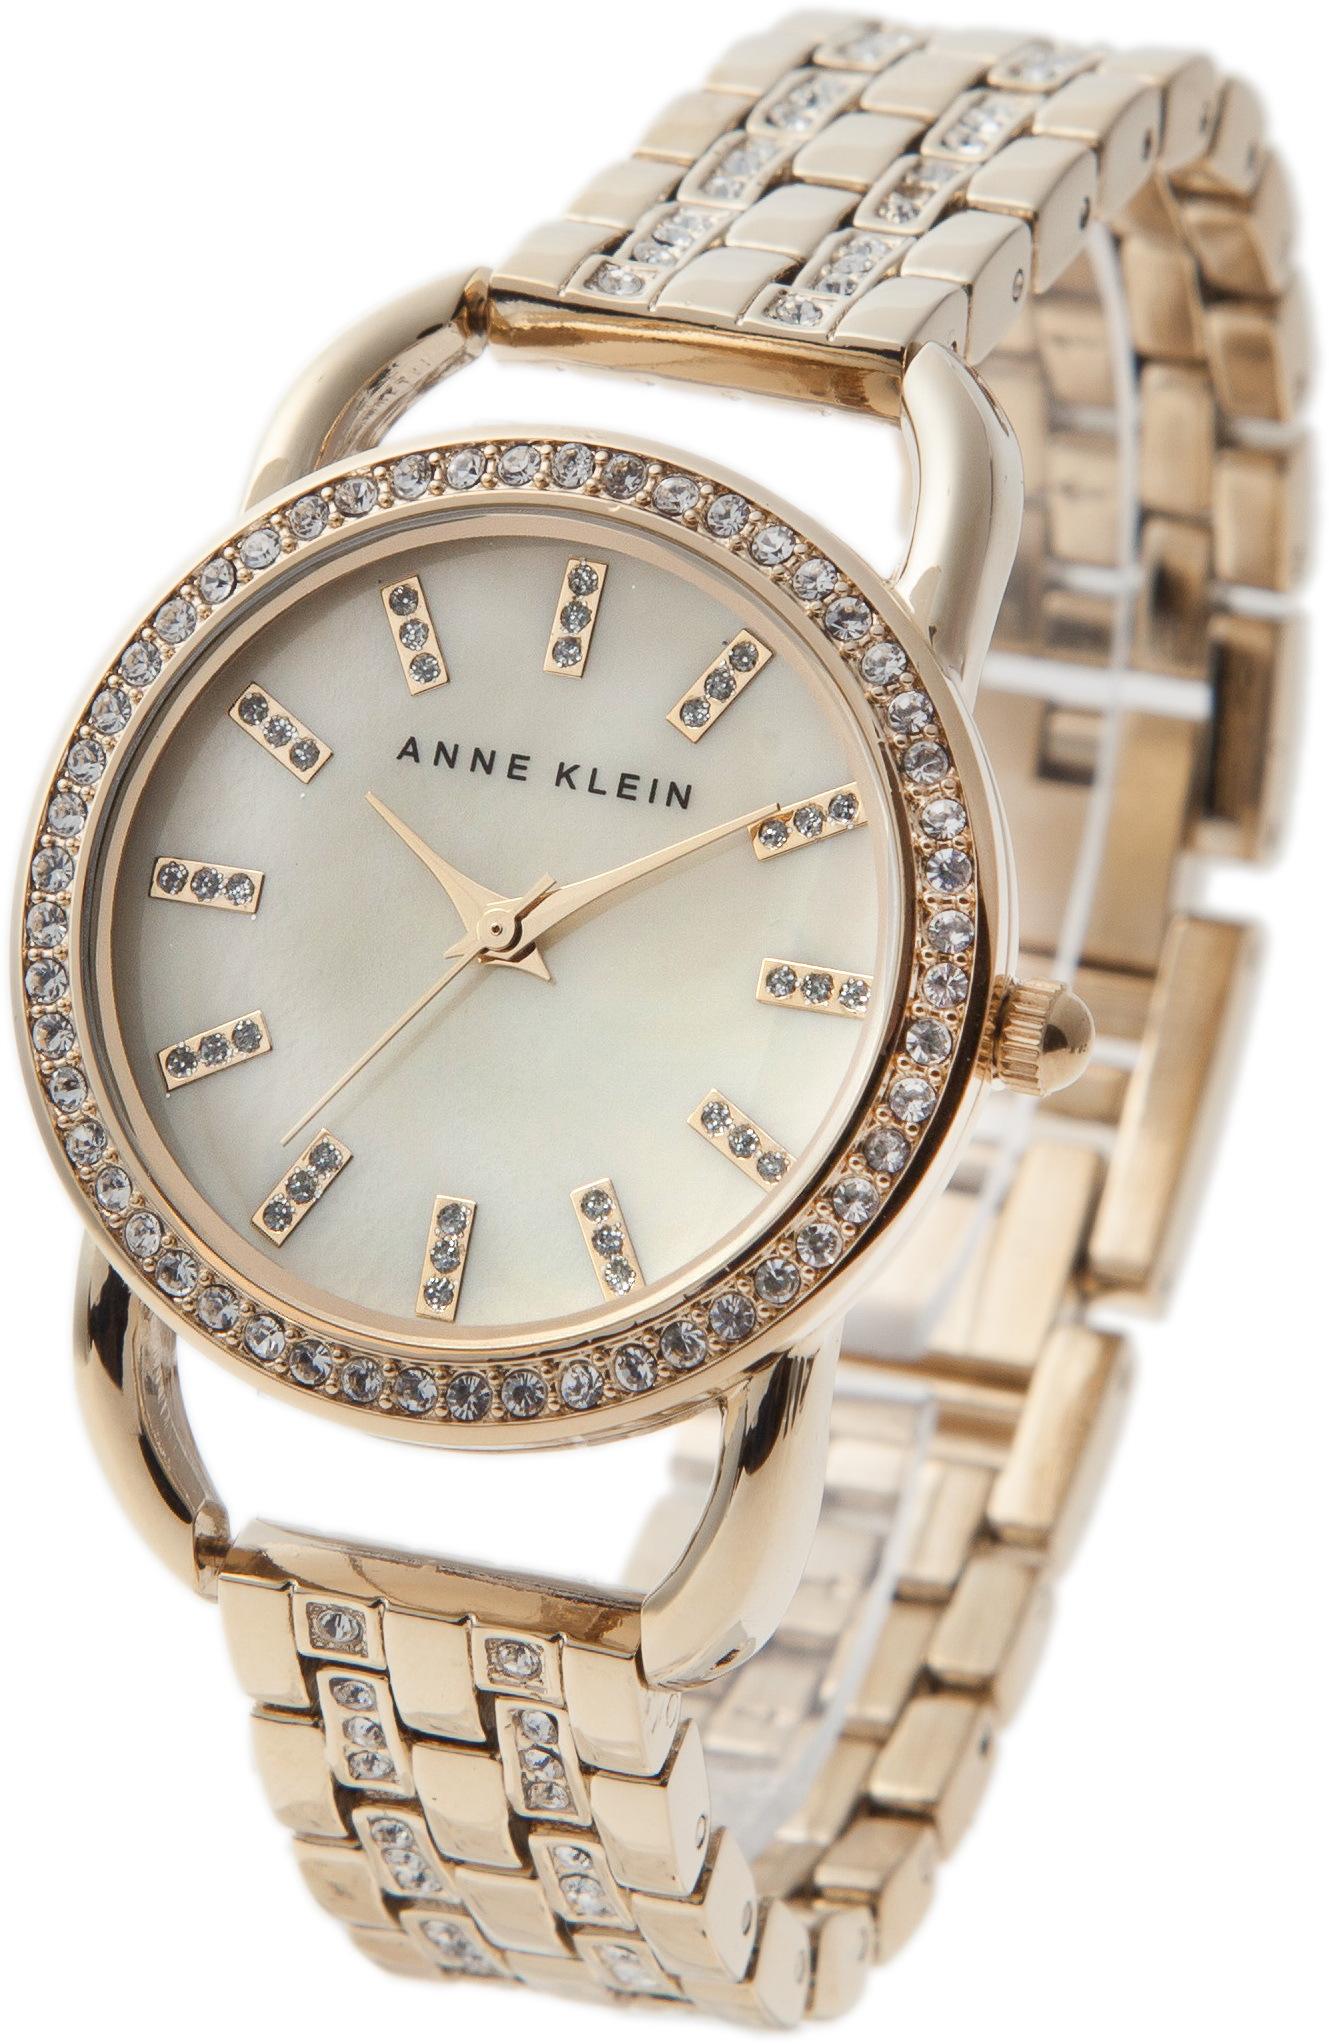 Anne Klein 1262CMGB - женские наручные часы из коллекции CrystalAnne Klein<br><br><br>Бренд: Anne Klein<br>Модель: Anne Klein 1262 CMGB<br>Артикул: 1262CMGB<br>Вариант артикула: None<br>Коллекция: Crystal<br>Подколлекция: None<br>Страна: США<br>Пол: женские<br>Тип механизма: кварцевые<br>Механизм: None<br>Количество камней: None<br>Автоподзавод: None<br>Источник энергии: от батарейки<br>Срок службы элемента питания: None<br>Дисплей: стрелки<br>Цифры: отсутствуют<br>Водозащита: None<br>Противоударные: None<br>Материал корпуса: не указан, PVD покрытие: позолота (полное)<br>Материал браслета: не указан, PVD покрытие (полное): позолота<br>Материал безеля: None<br>Стекло: минеральное<br>Антибликовое покрытие: None<br>Цвет корпуса: None<br>Цвет браслета: None<br>Цвет циферблата: None<br>Цвет безеля: None<br>Размеры: 31x10 мм<br>Диаметр: None<br>Диаметр корпуса: None<br>Толщина: None<br>Ширина ремешка: None<br>Вес: None<br>Спорт-функции: None<br>Подсветка: None<br>Вставка: кристаллы Swarovski<br>Отображение даты: None<br>Хронограф: None<br>Таймер: None<br>Термометр: None<br>Хронометр: None<br>GPS: None<br>Радиосинхронизация: None<br>Барометр: None<br>Скелетон: None<br>Дополнительная информация: None<br>Дополнительные функции: None